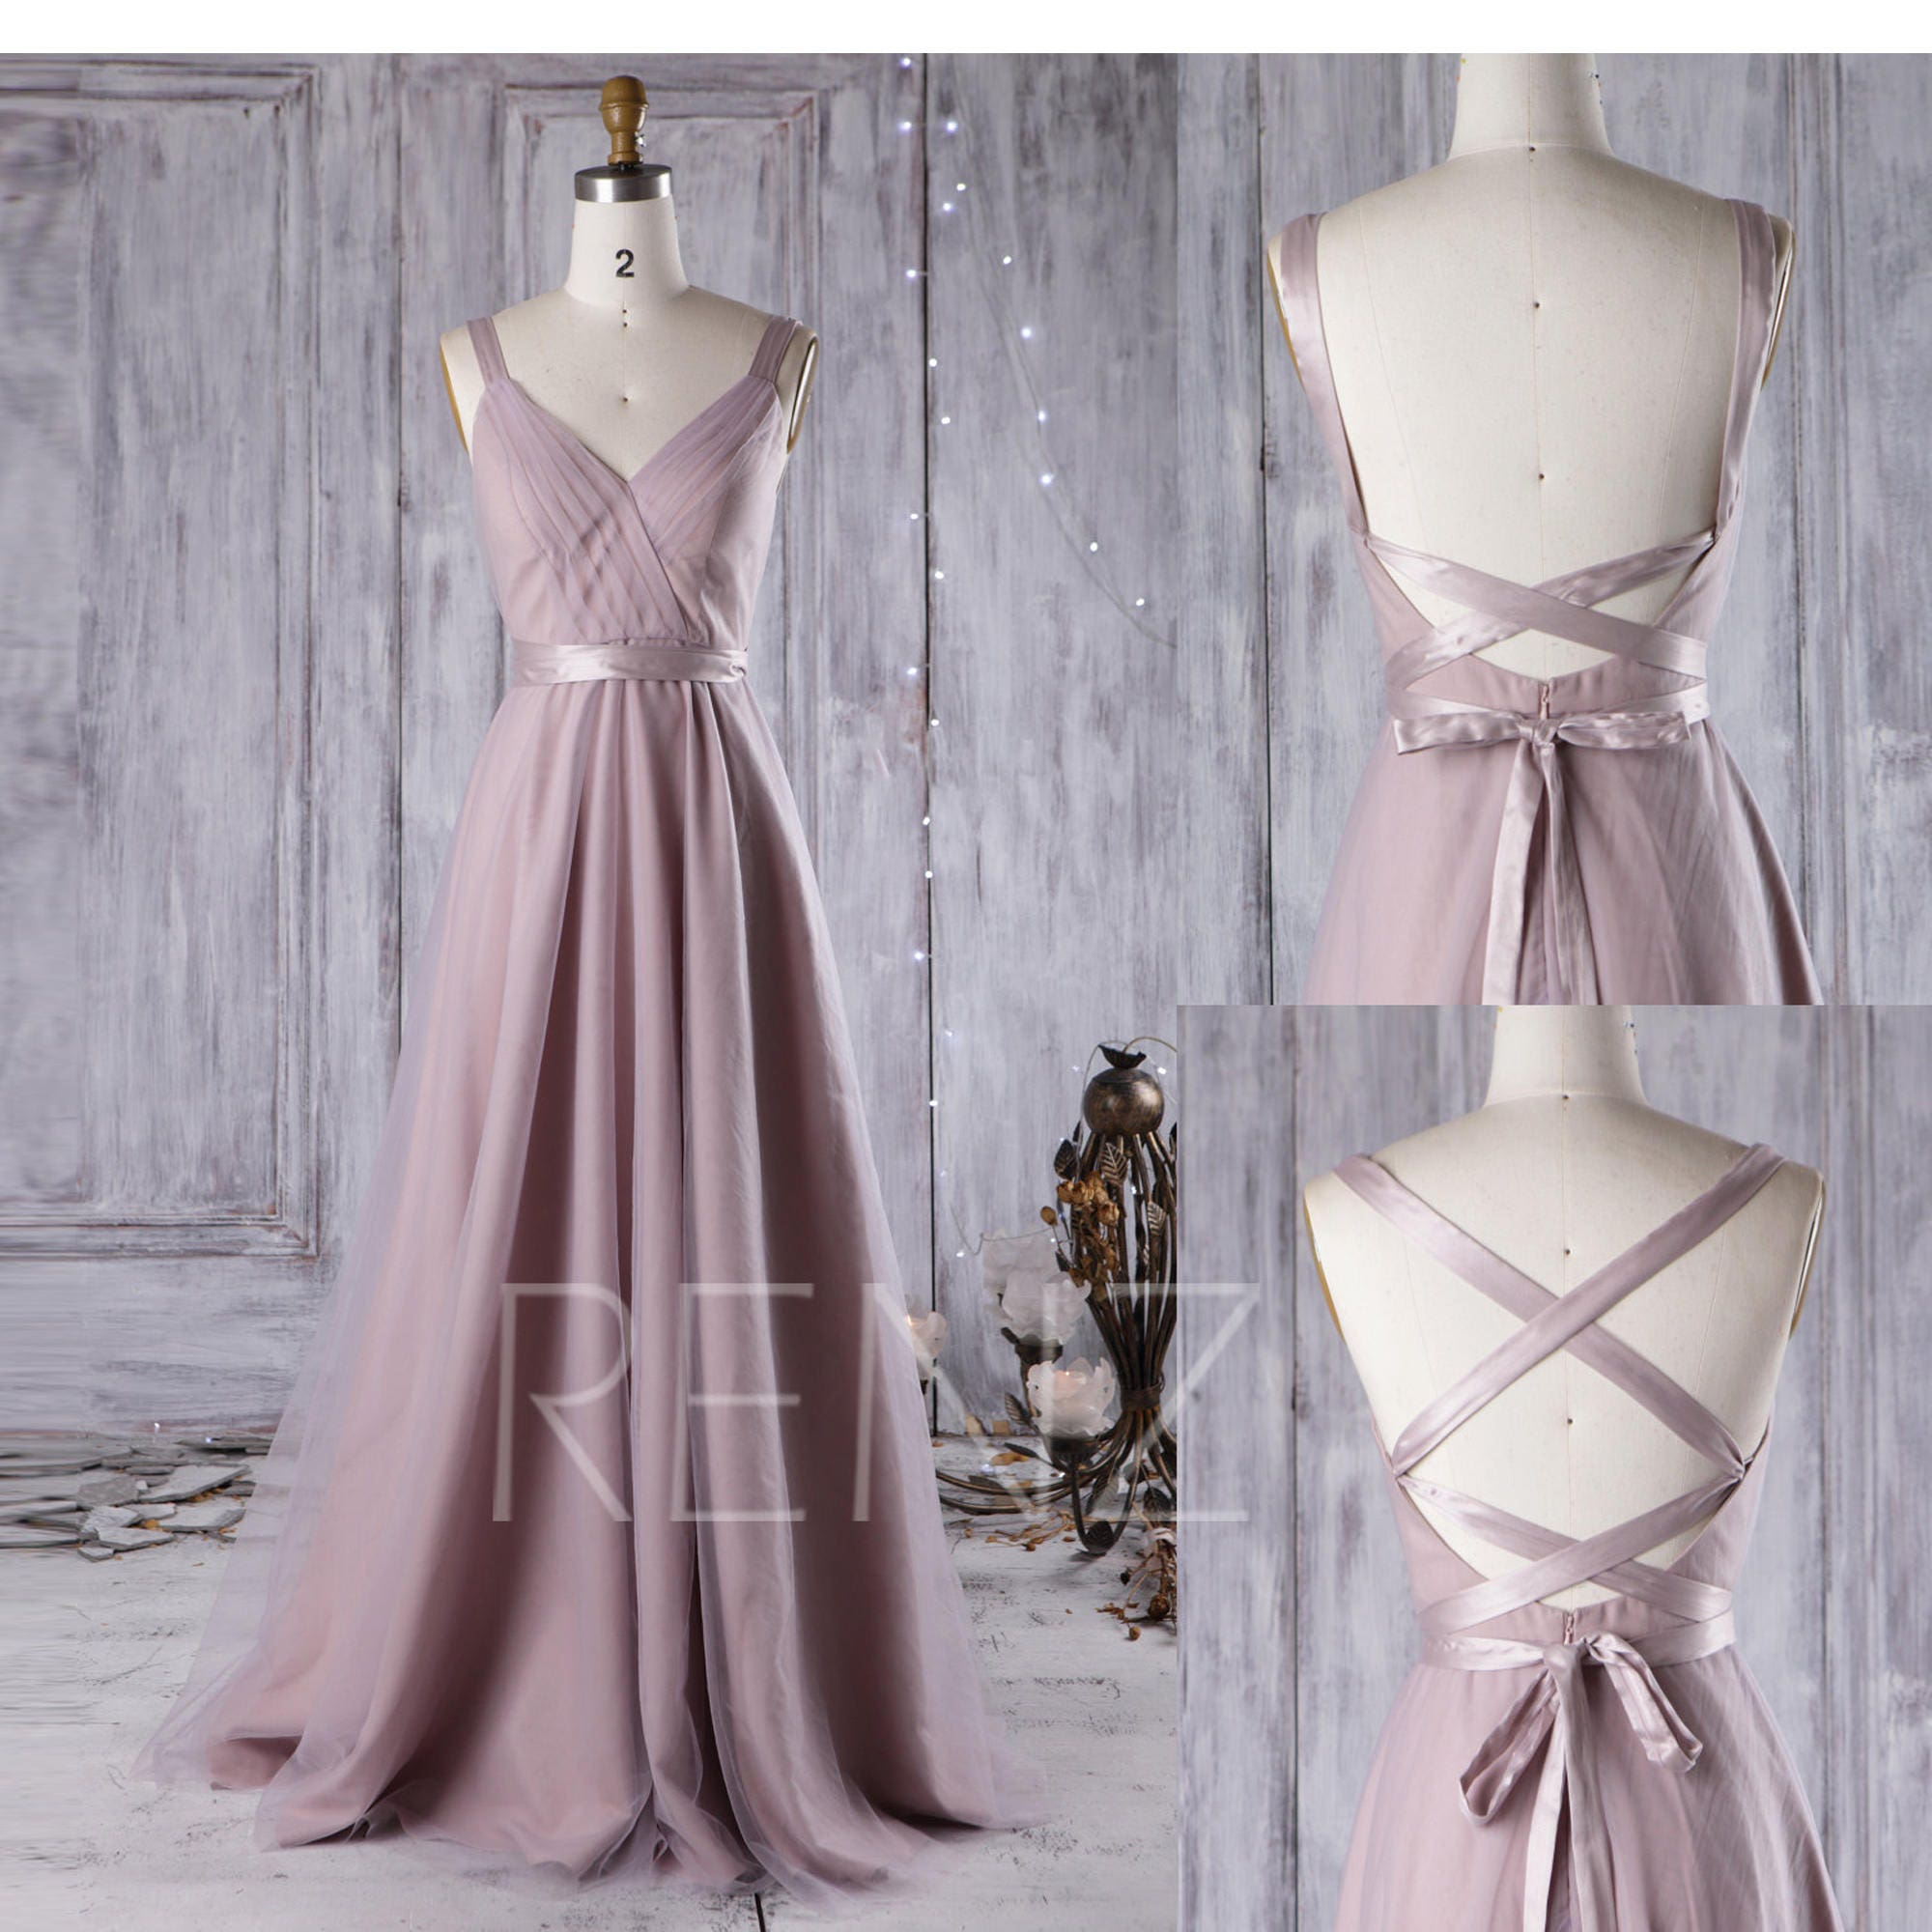 Lila Brautjungfer Kleid Cabrio Riemen A Linie Hochzeitskleid